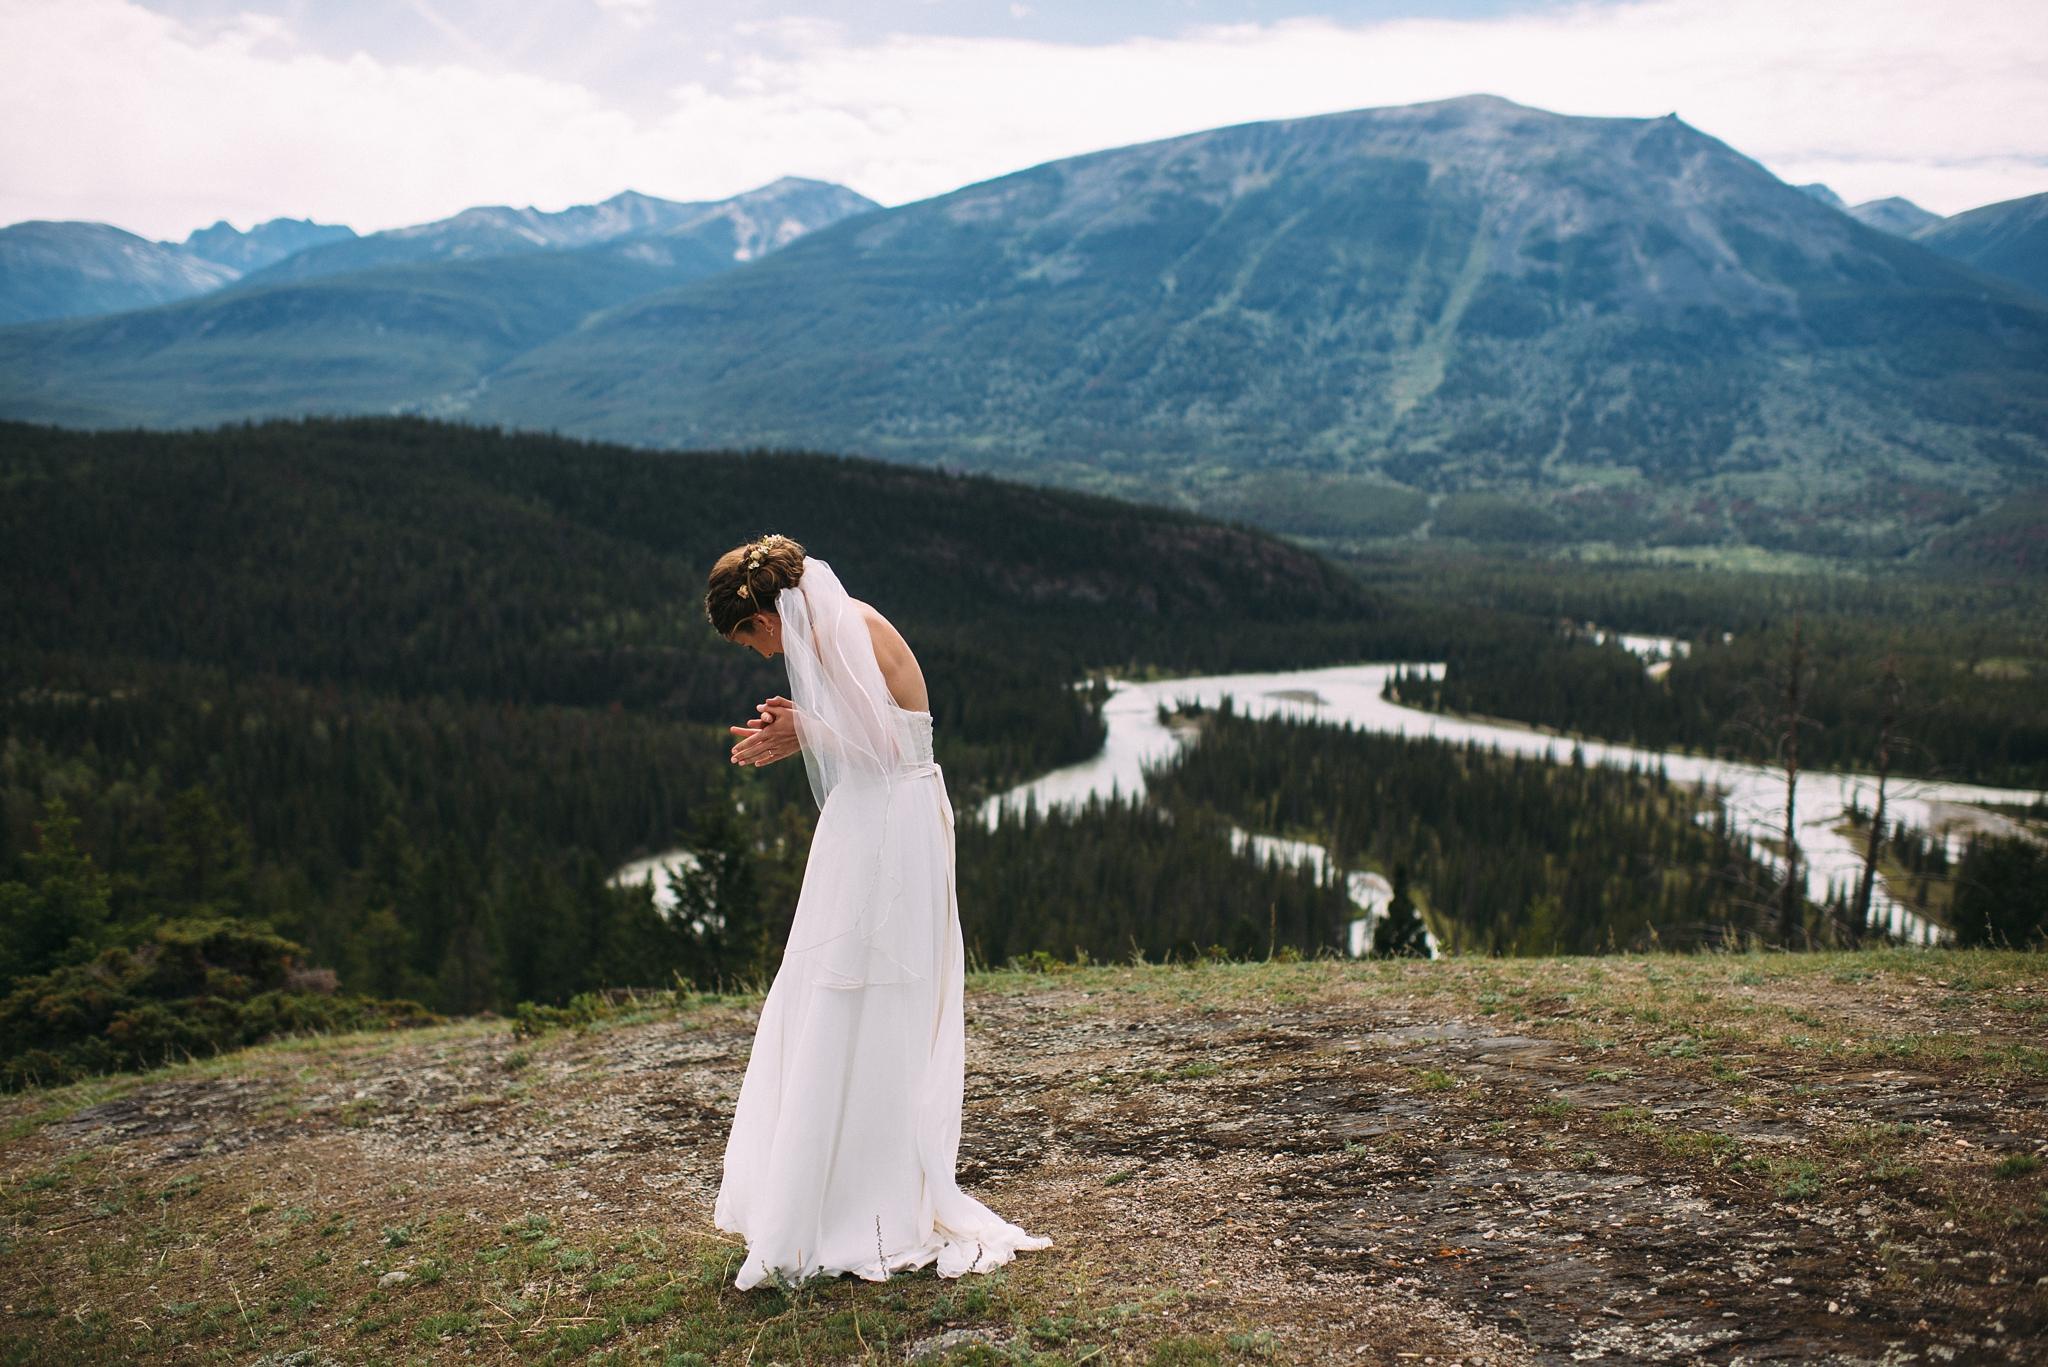 kaihla_tonai_intimate_wedding_elopement_photographer_2469